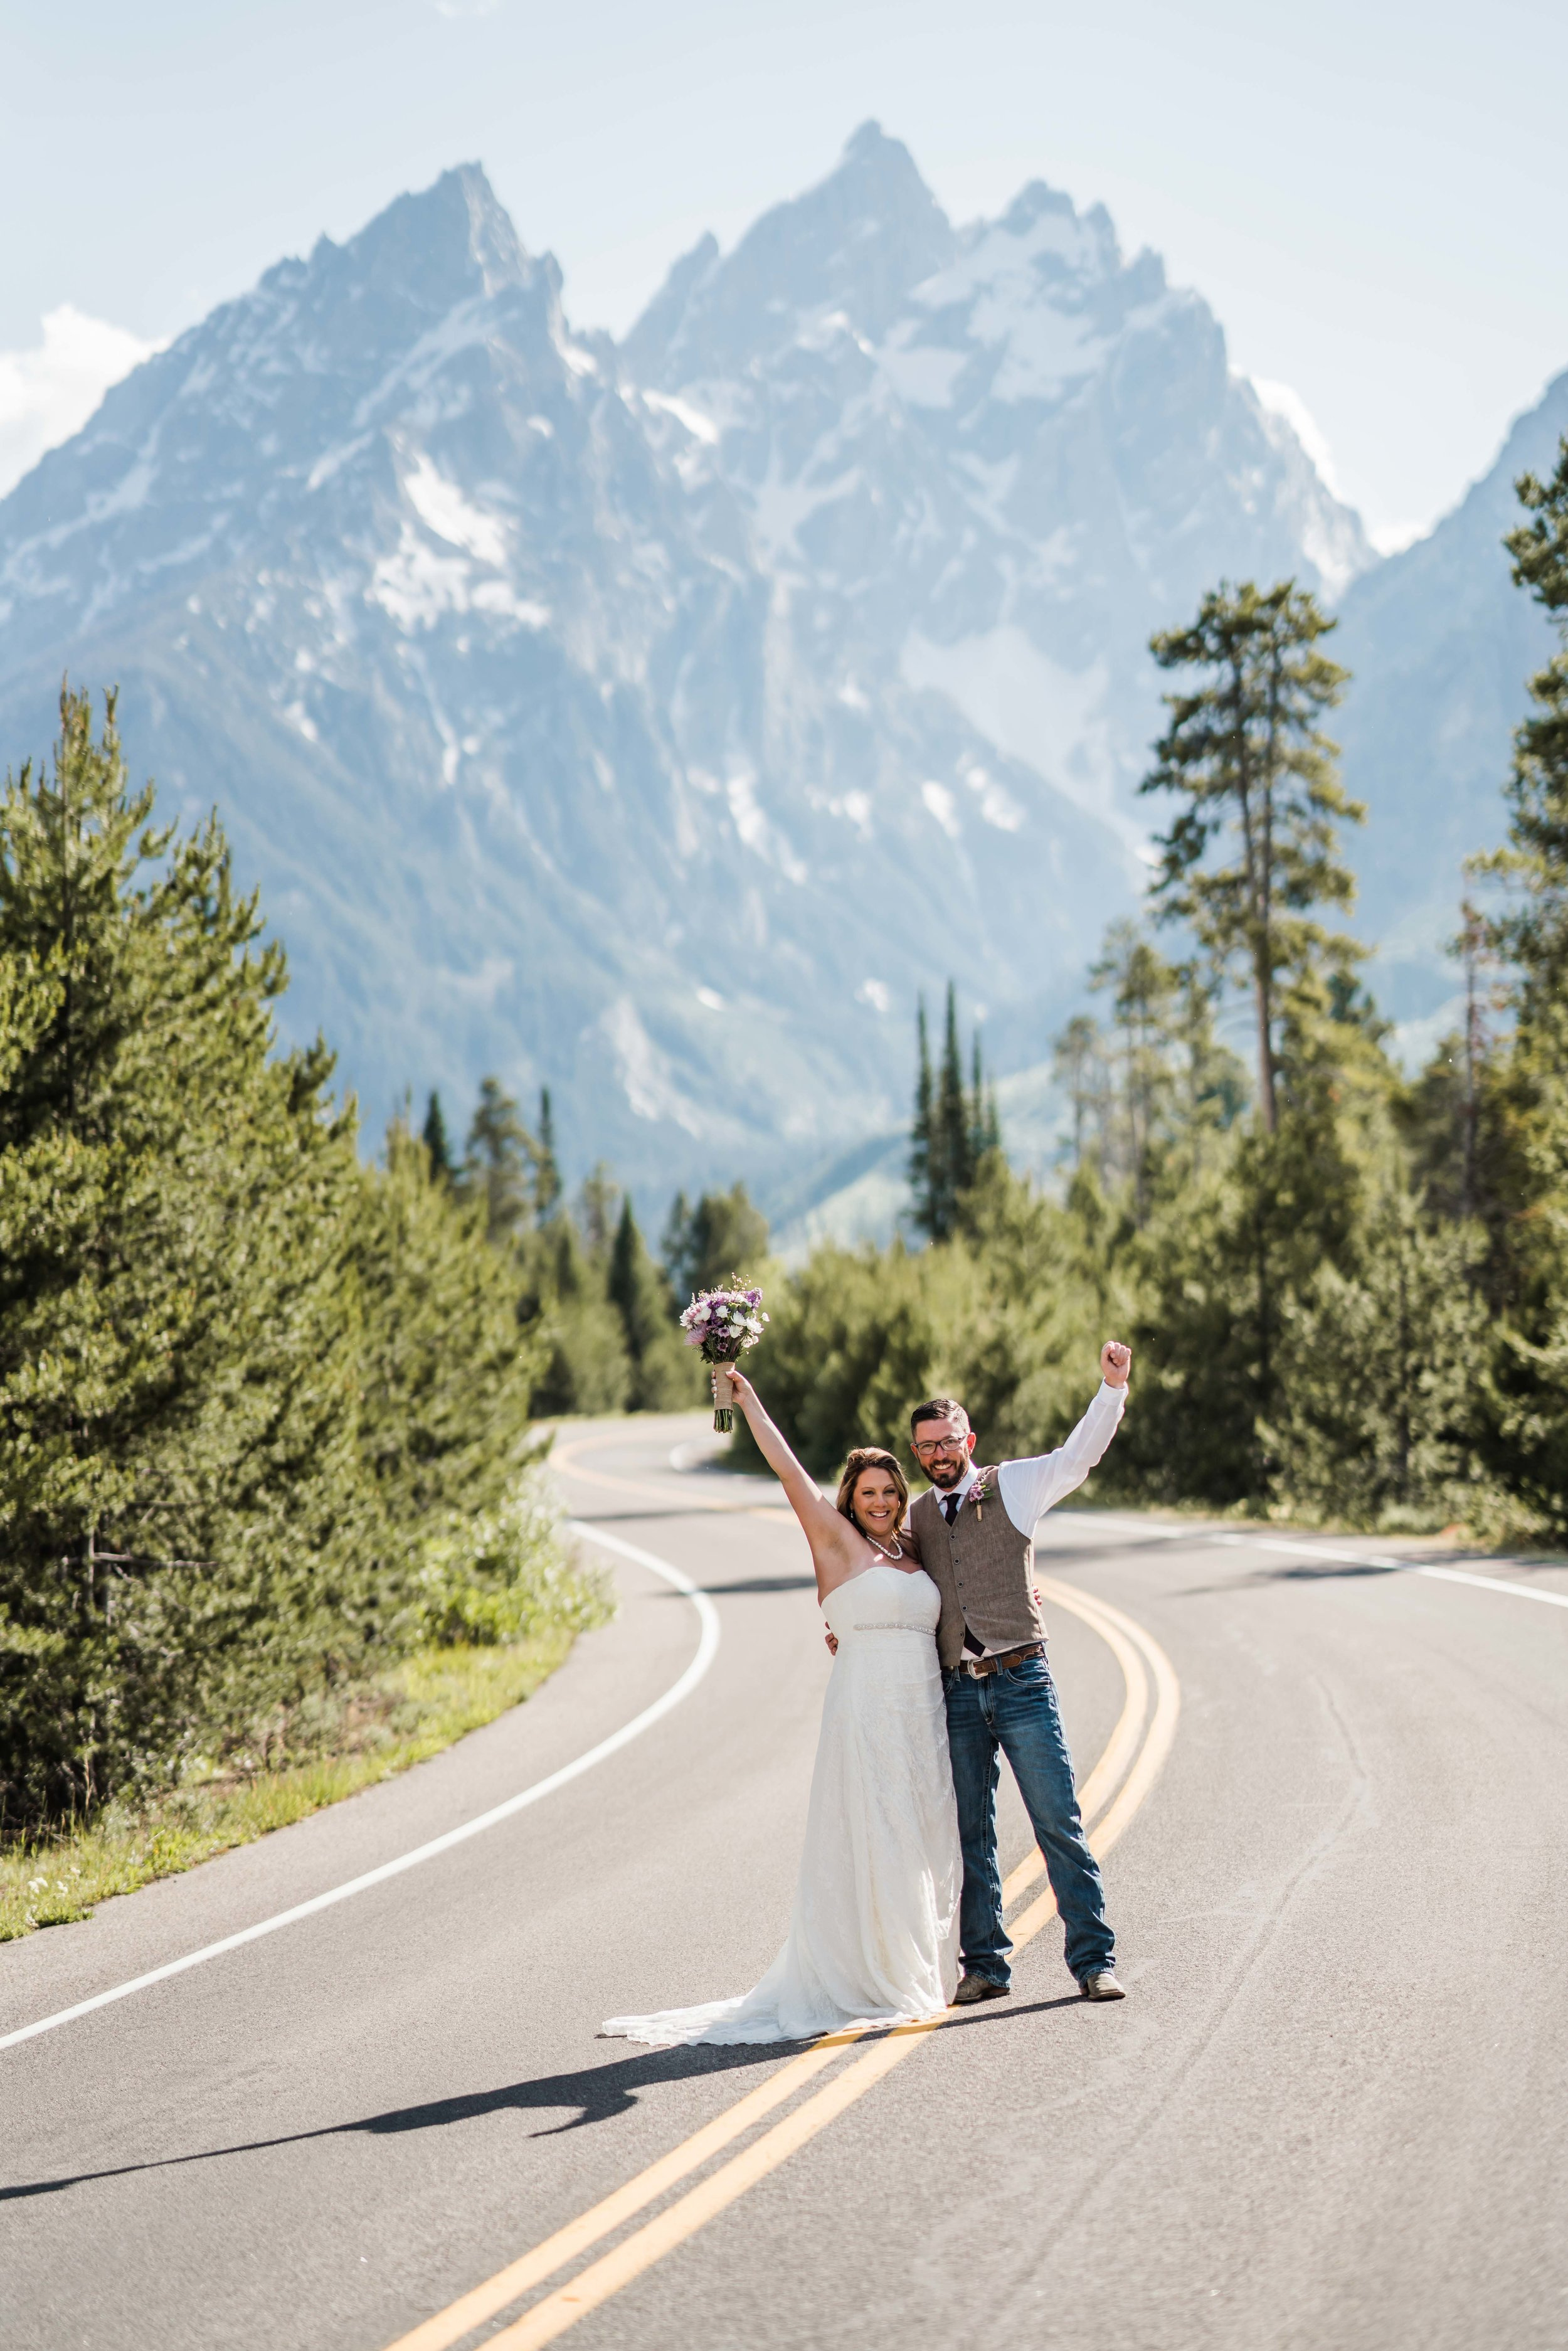 jackson hole adventure wedding photography at schwabachers landing in GTNP -DSC03652.jpg